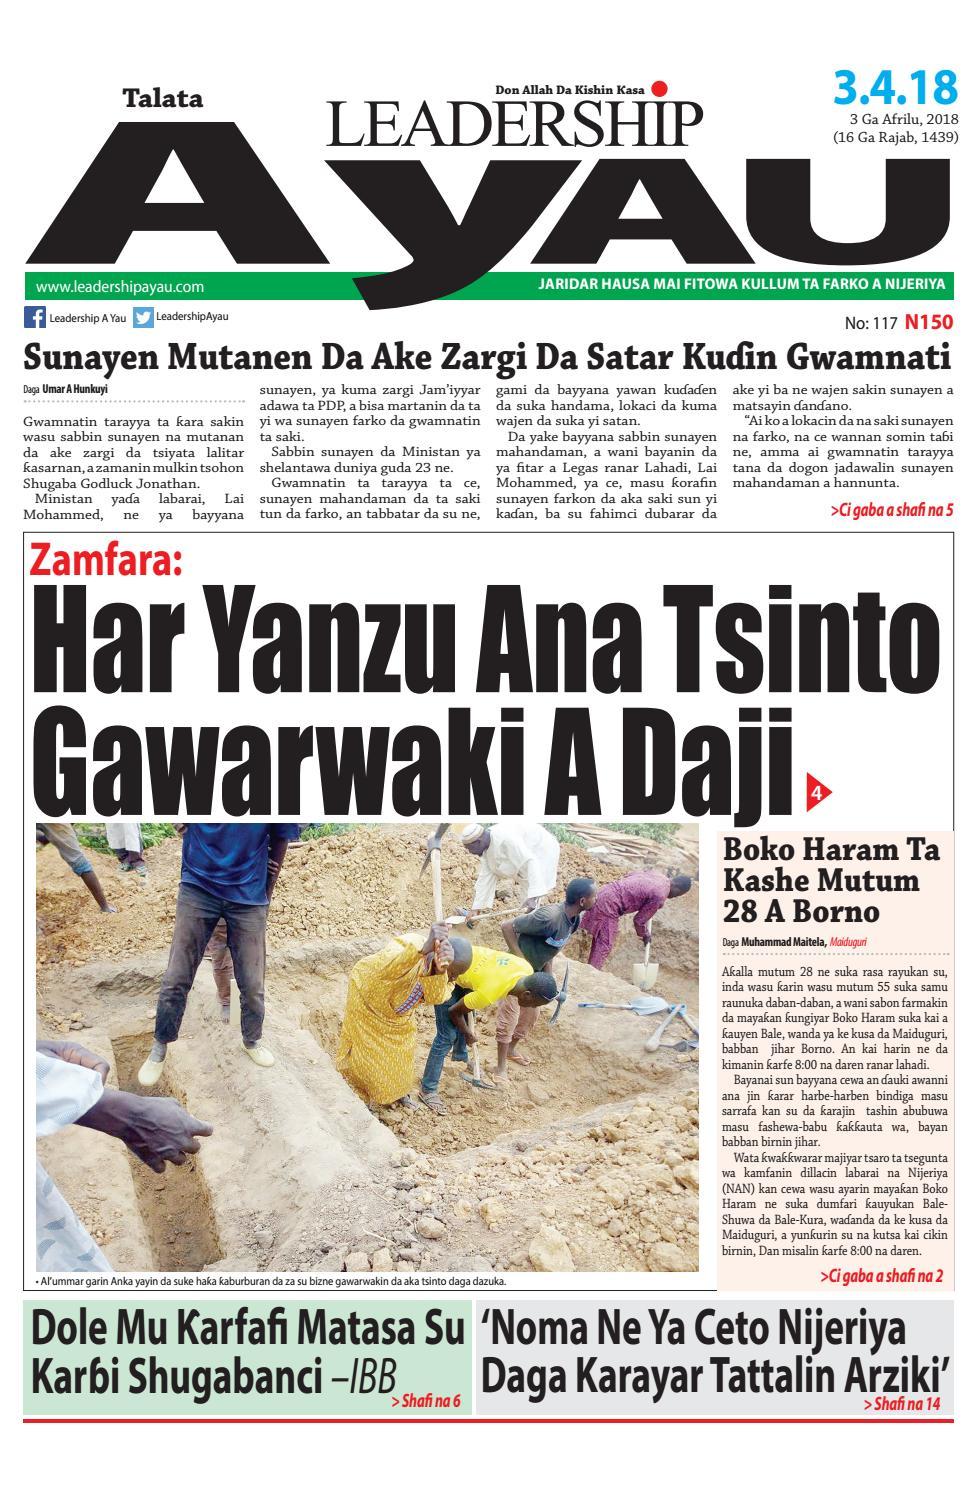 LEADERSHIP A Yau E-paper 3 Ga Afrilu 2018 by Leadership